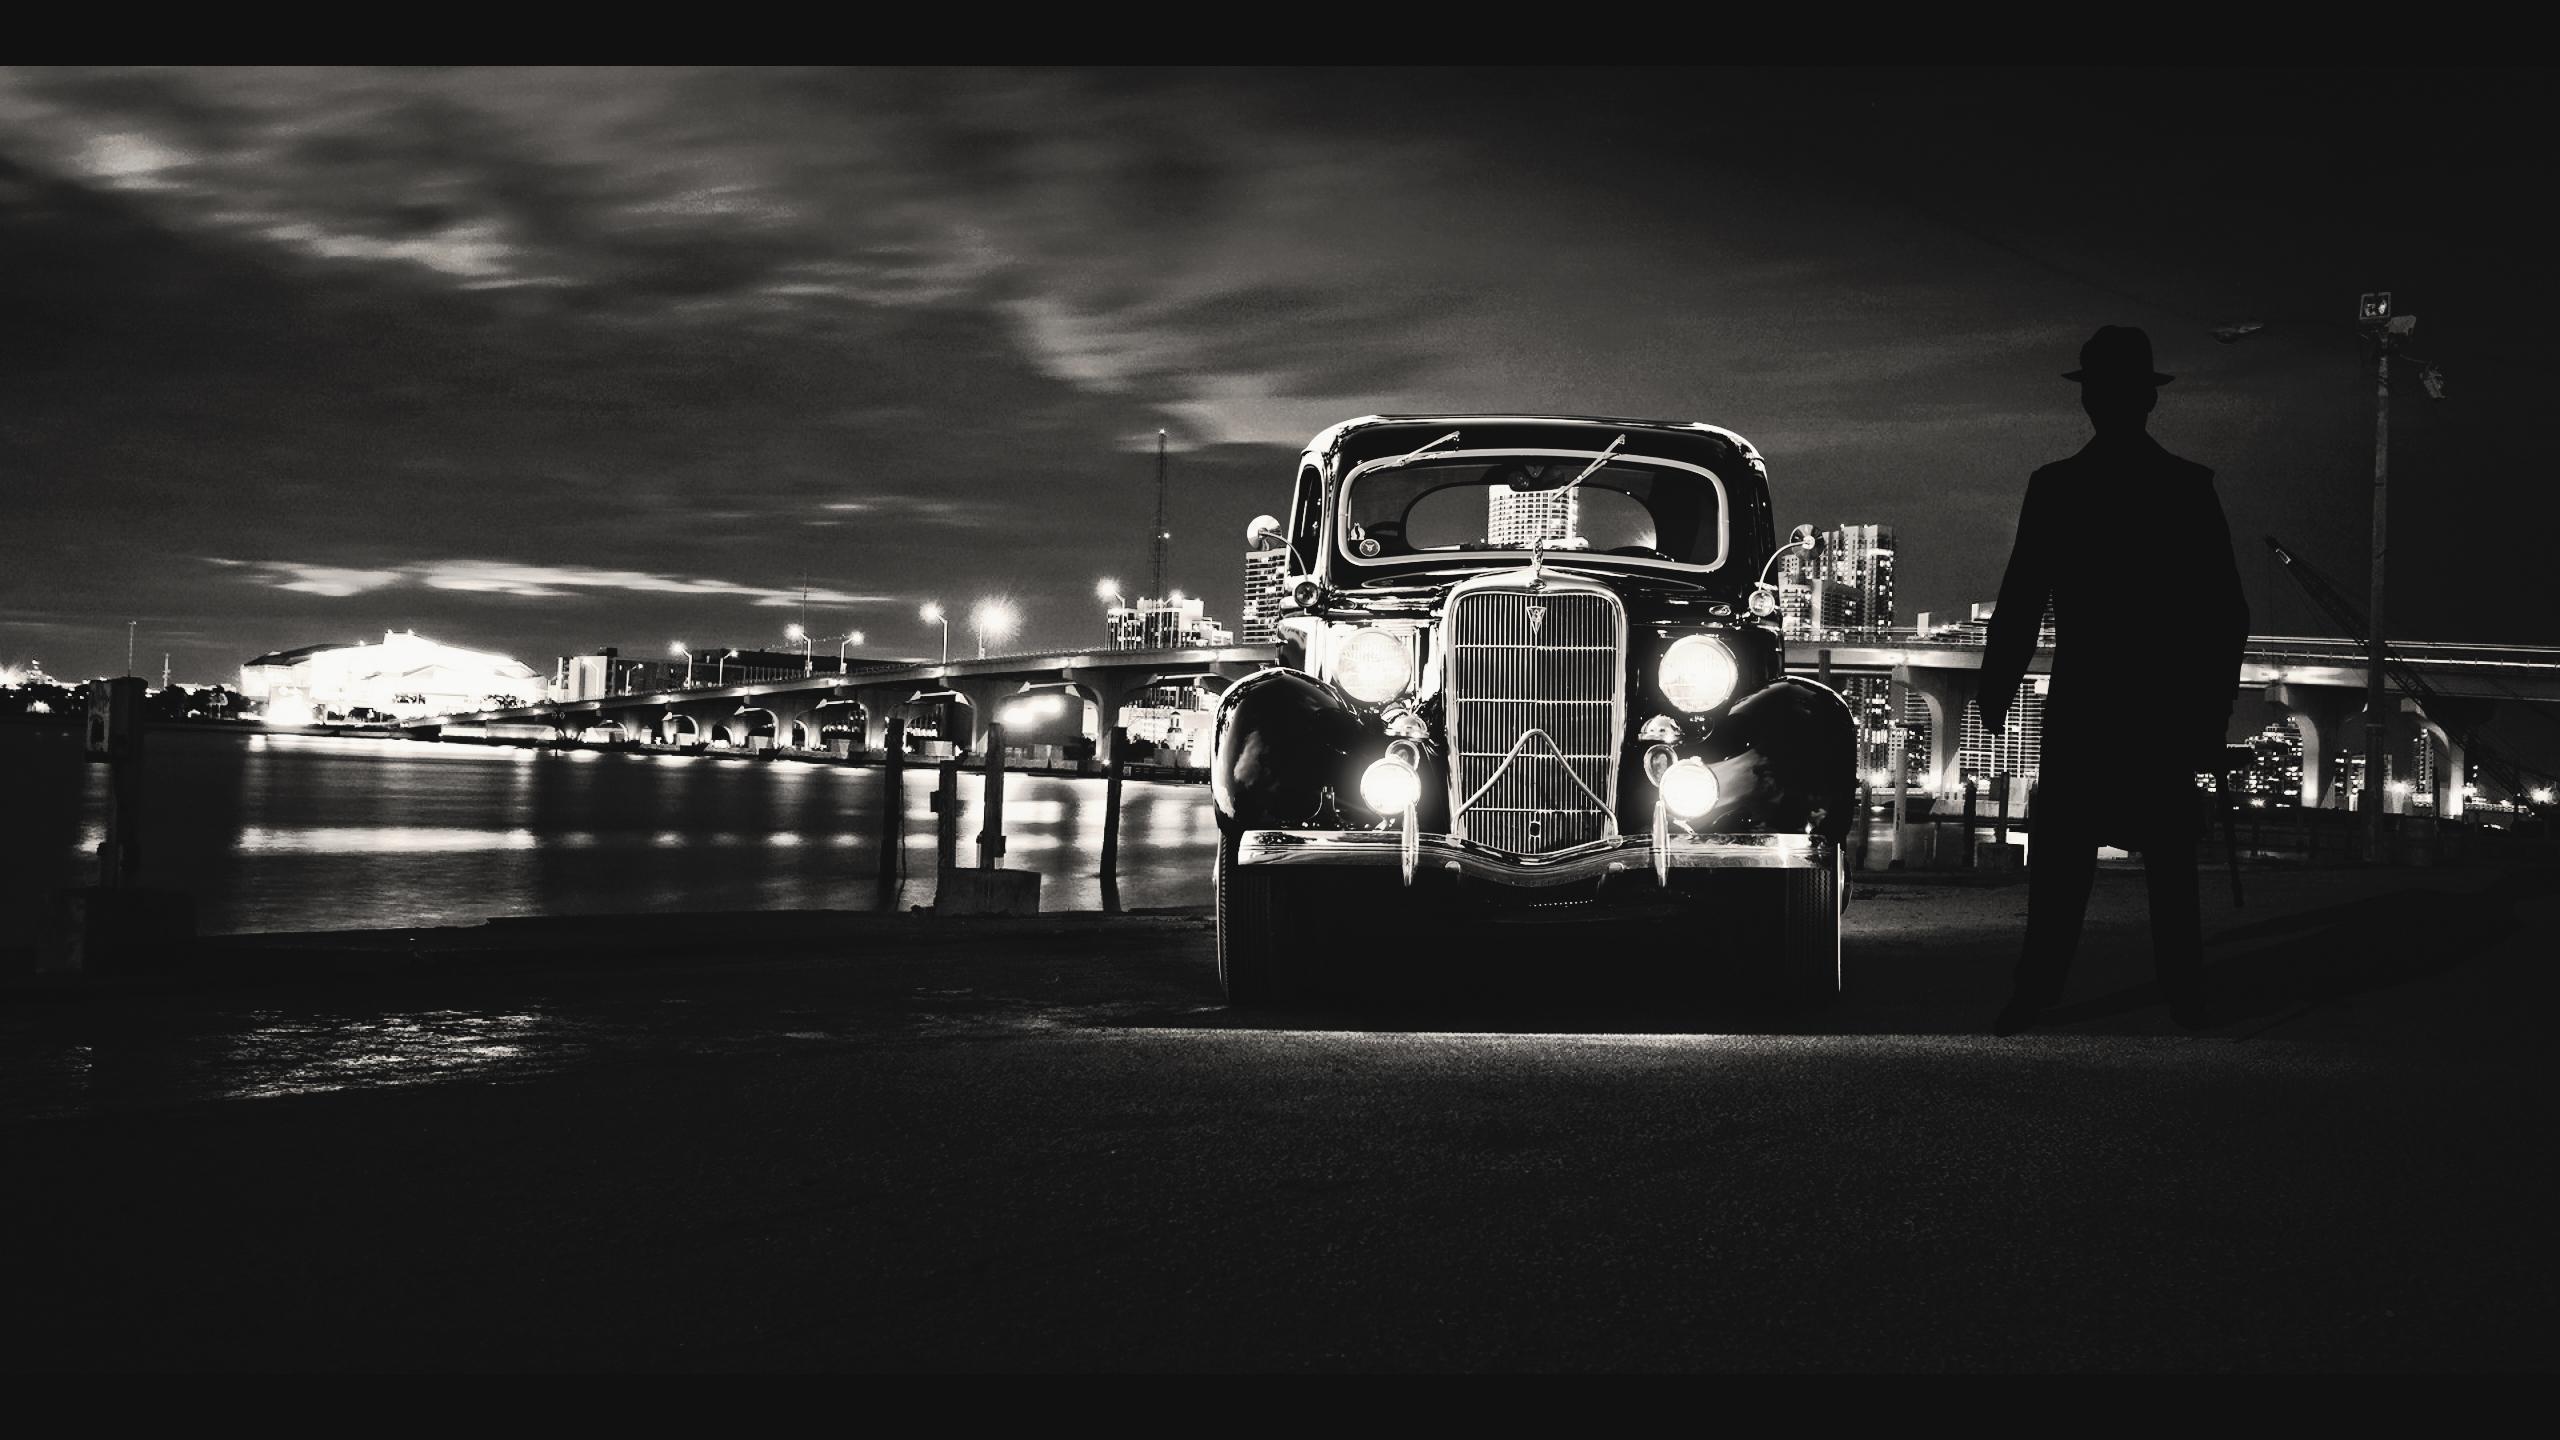 Film Noir by Roland0101 2560x1440